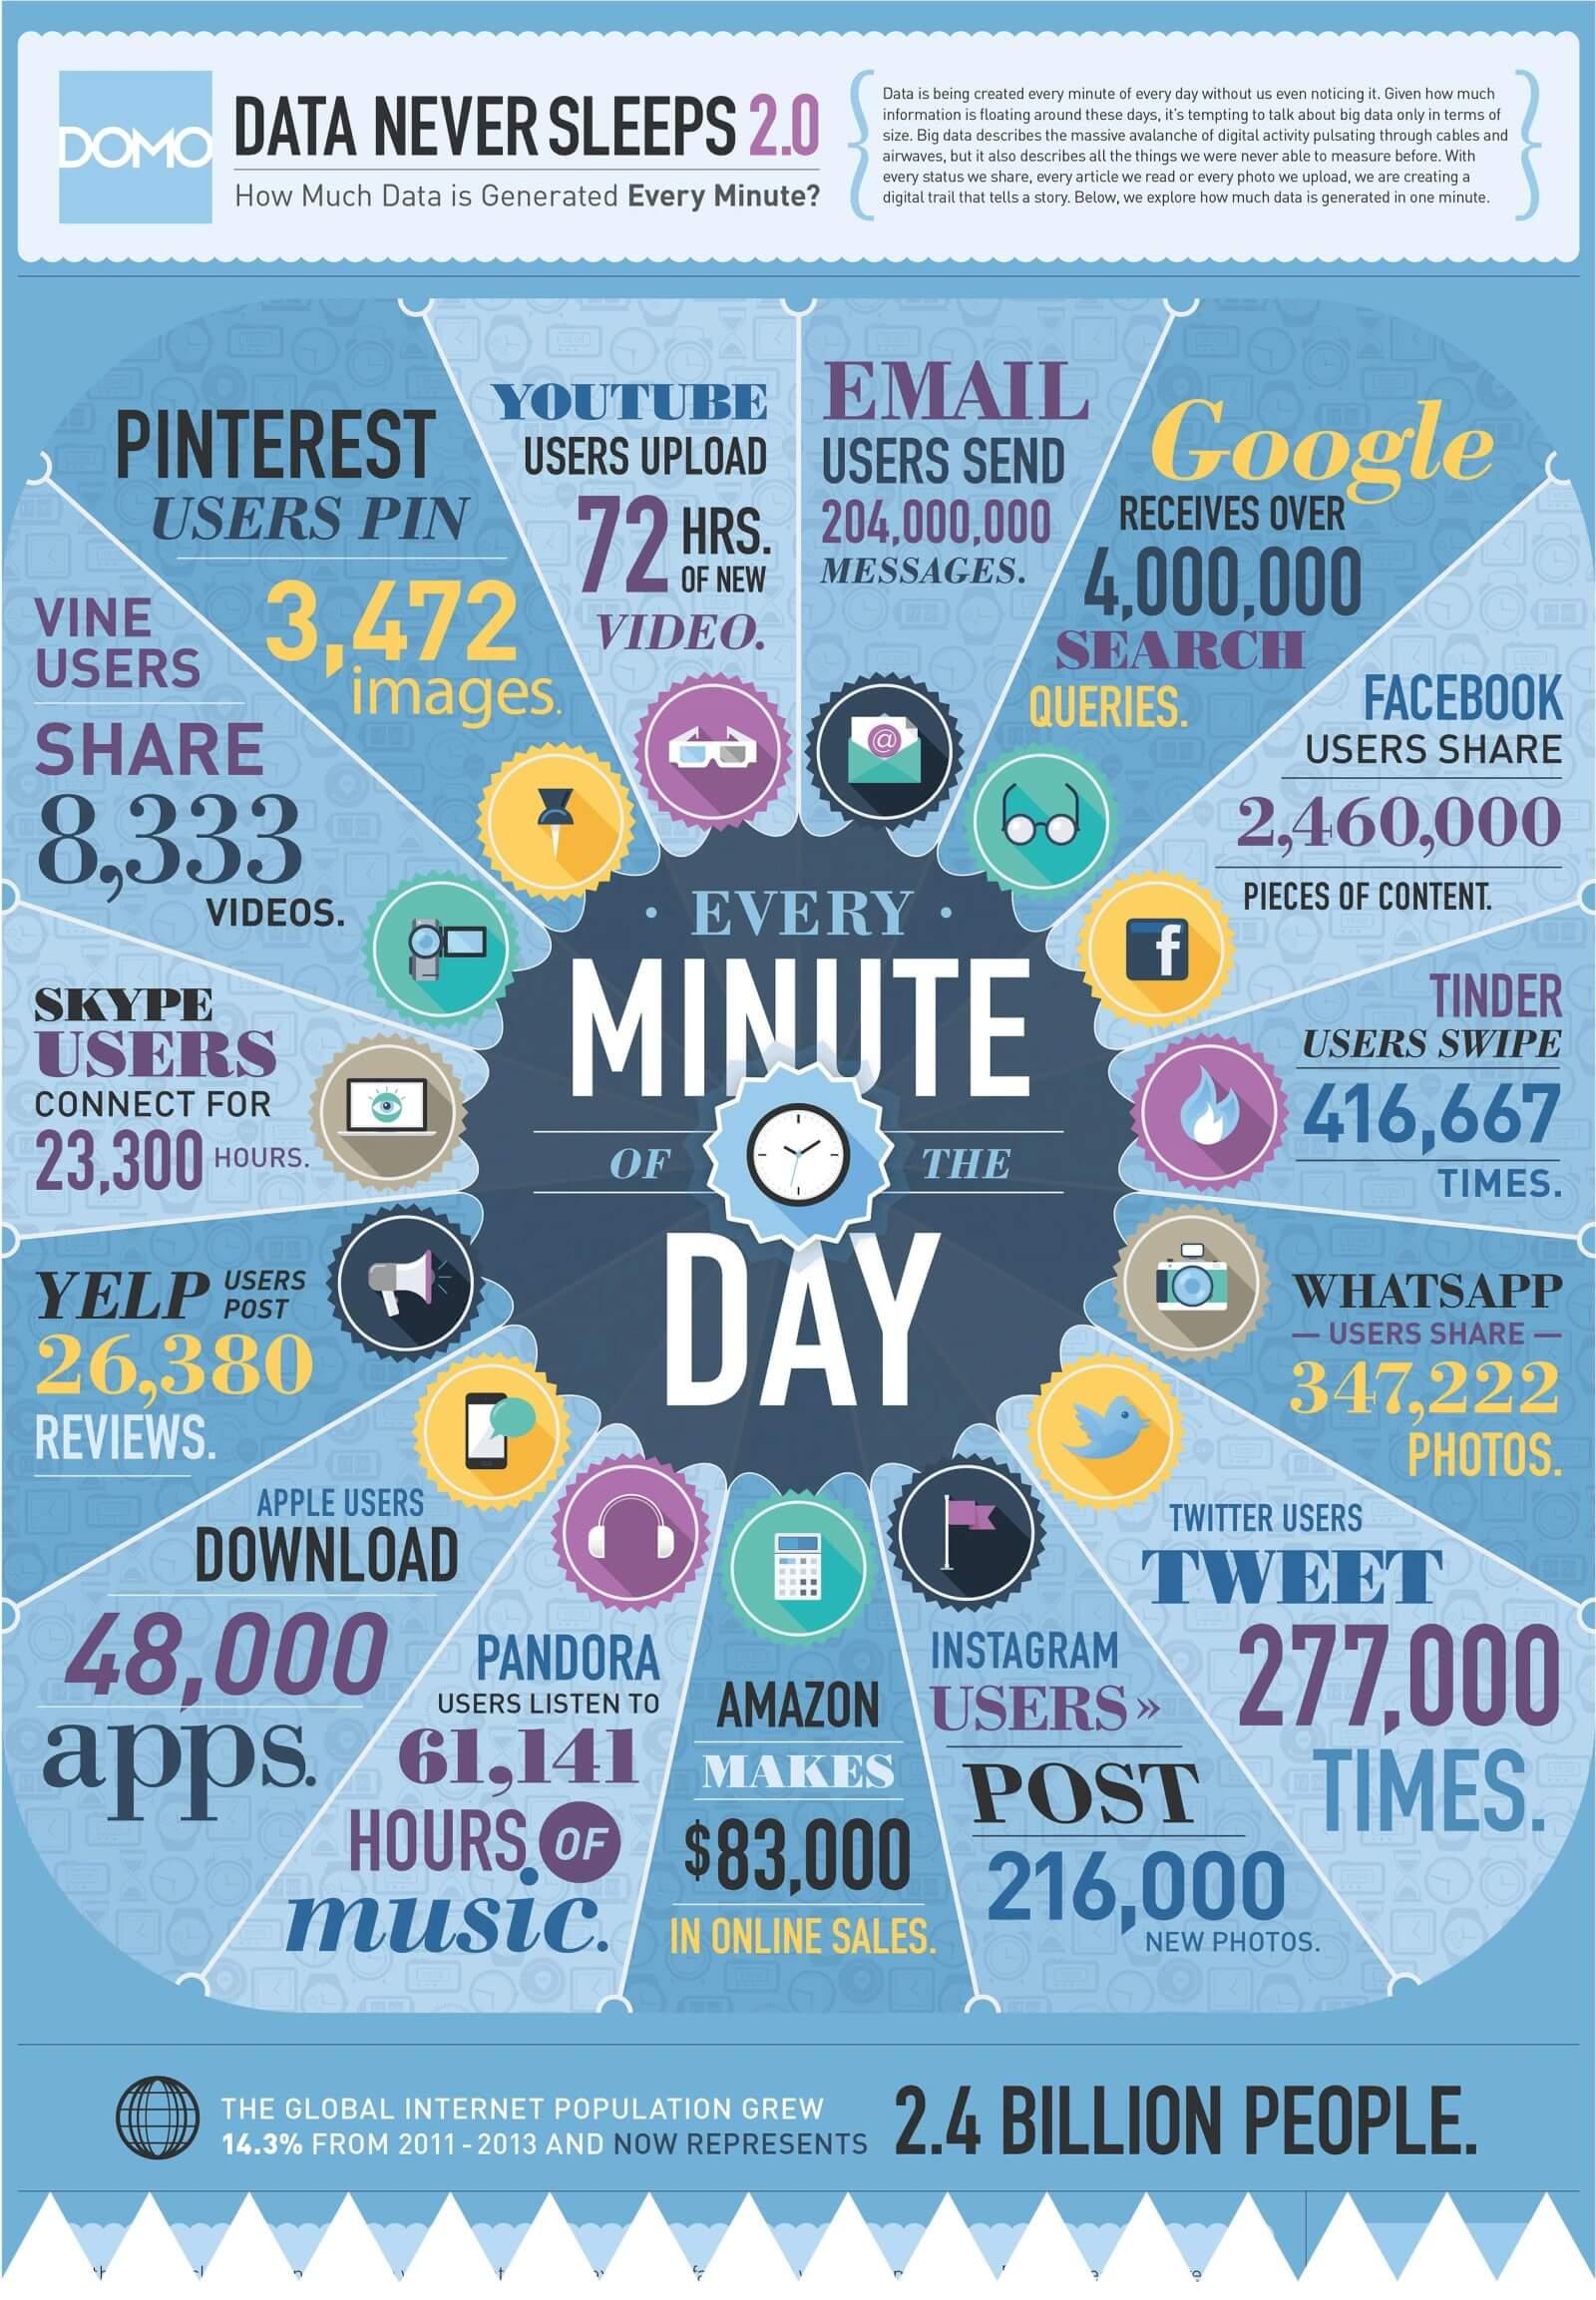 Business Intelligence infographic data never sleeps 2.0